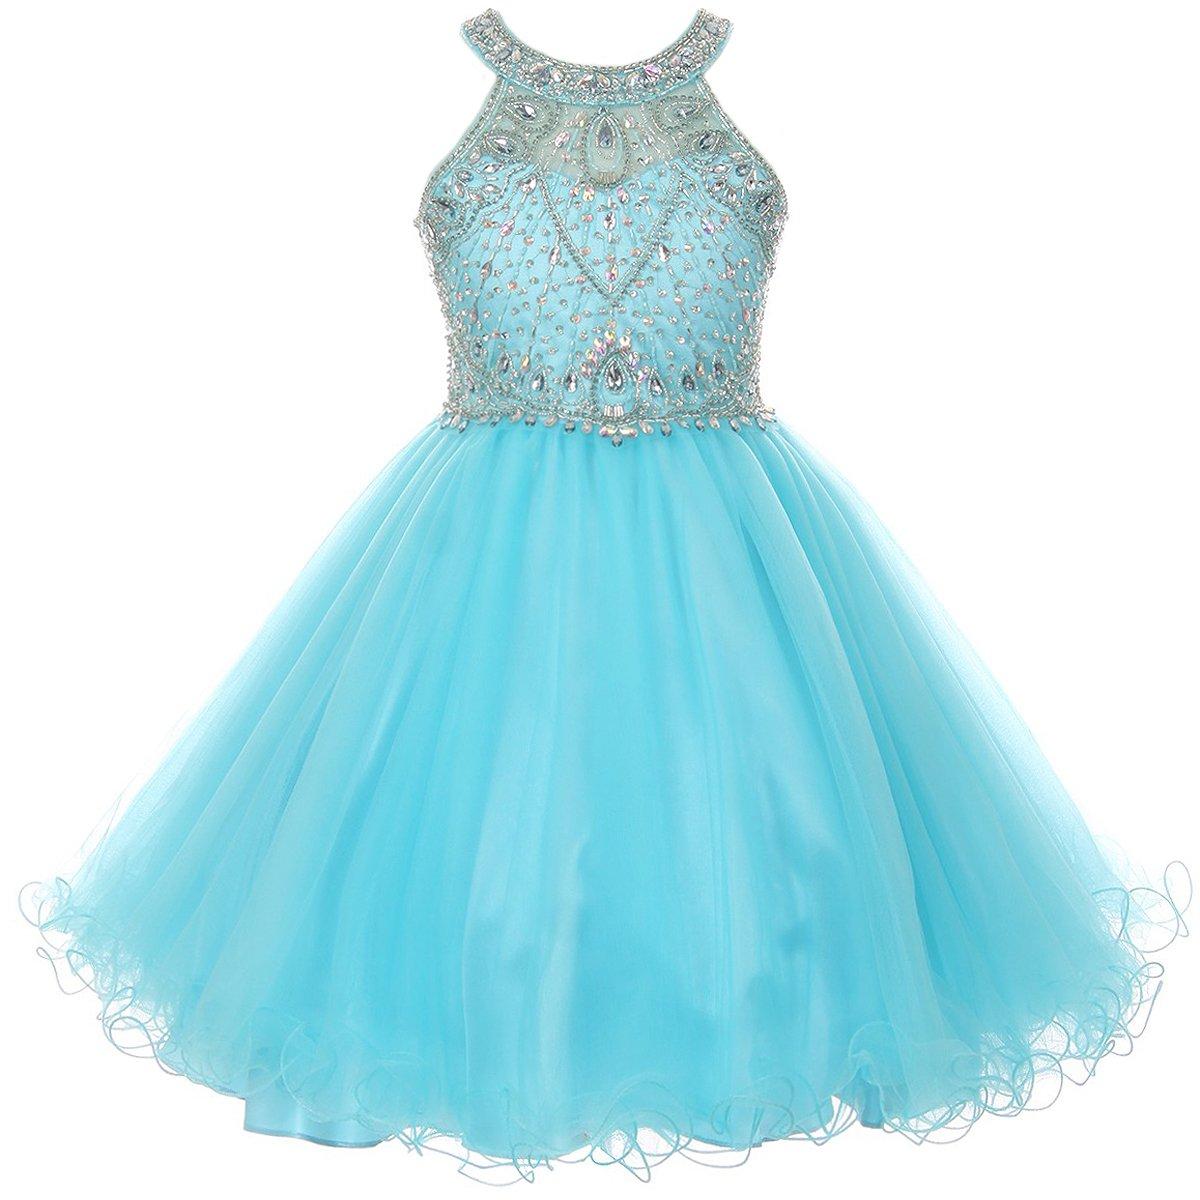 Big Girls Stunning Rhinestones Halter Neck Wired Tulle Corset Back Flower Girl Dress Aqua - Size 10 by CrunchyCucumber